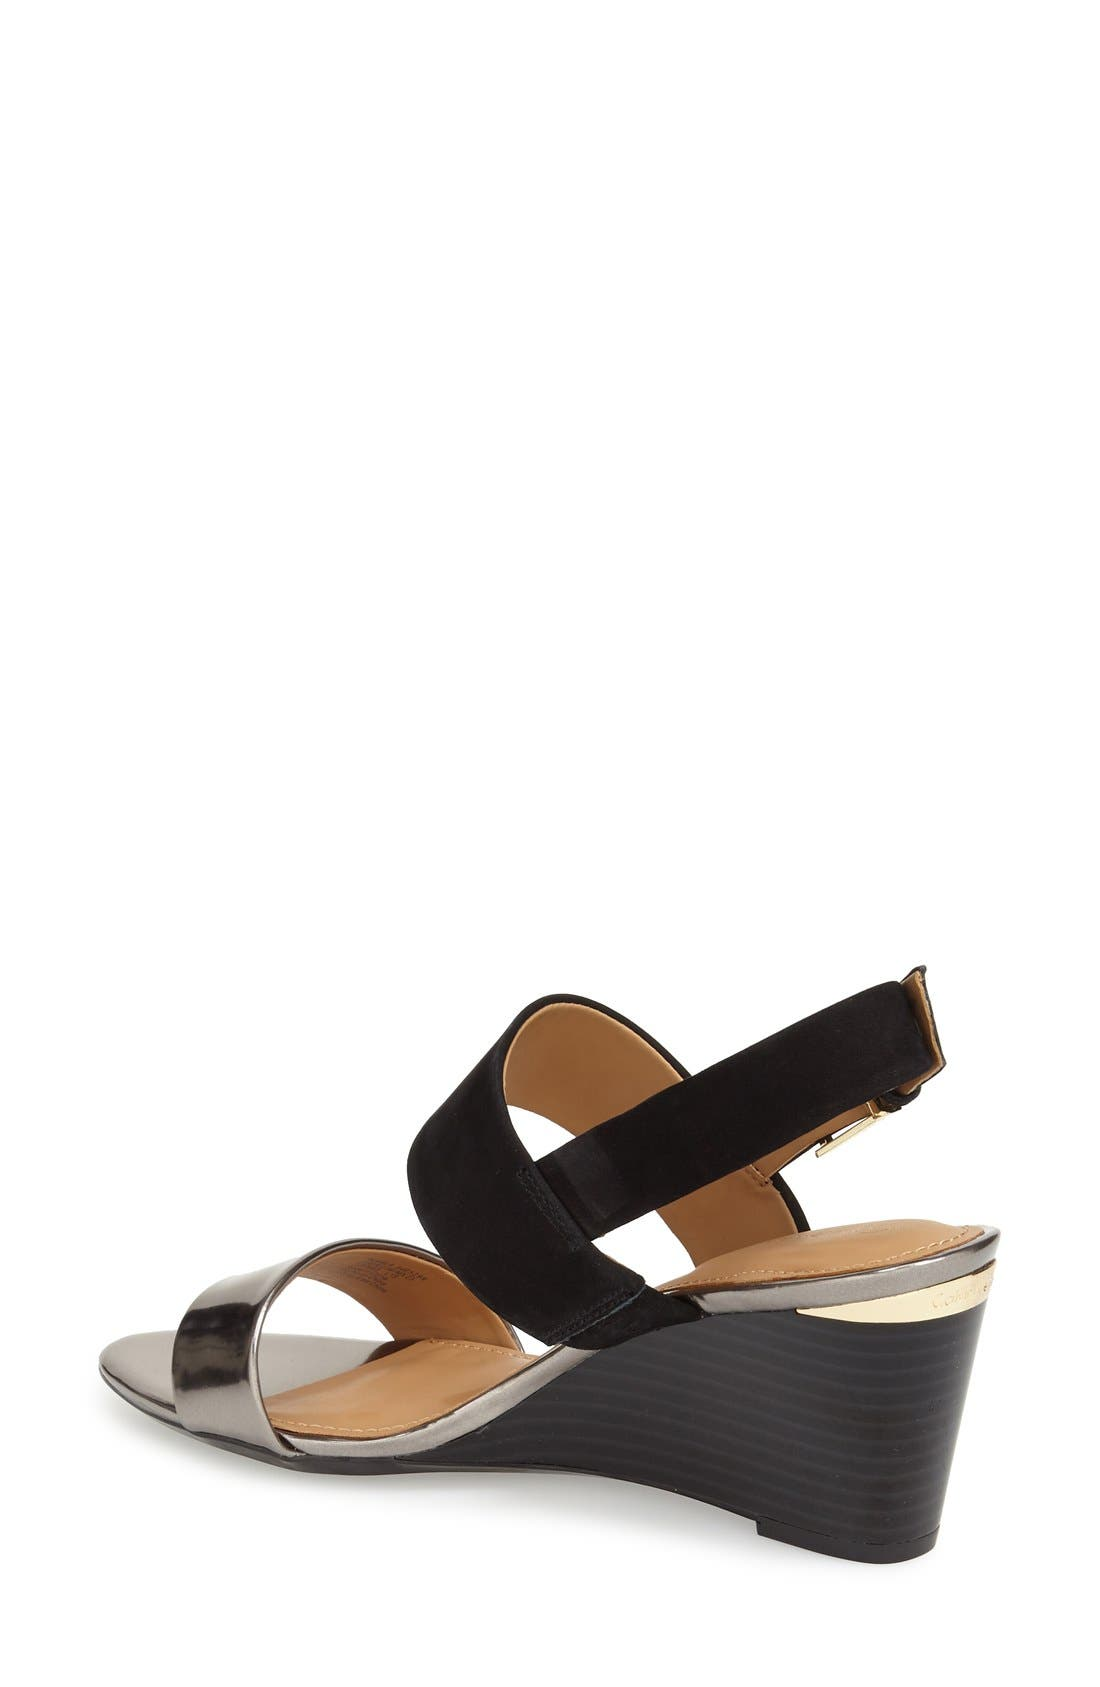 'Pearla' Wedge Sandal,                             Alternate thumbnail 3, color,                             001